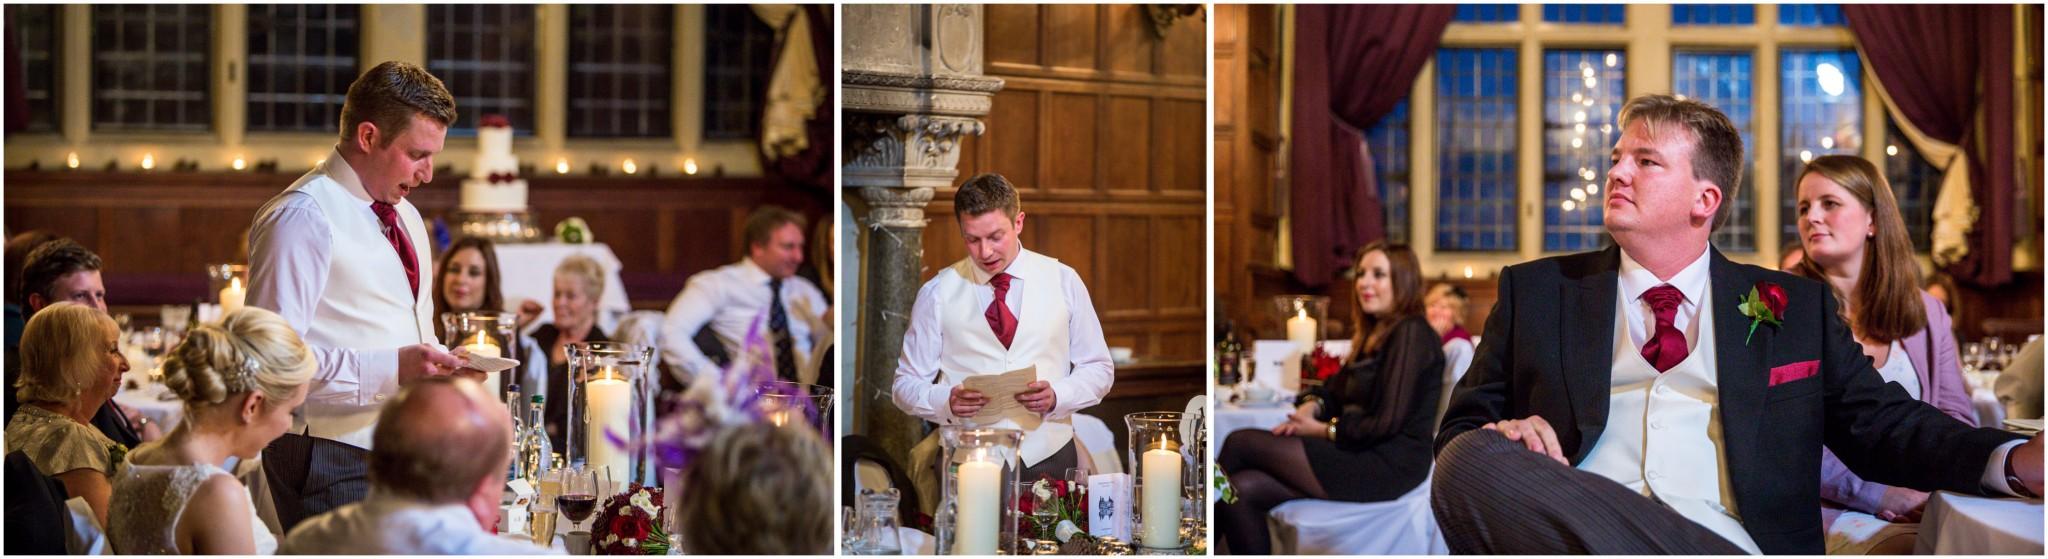 Rhinefield House Wedding Groom's speech